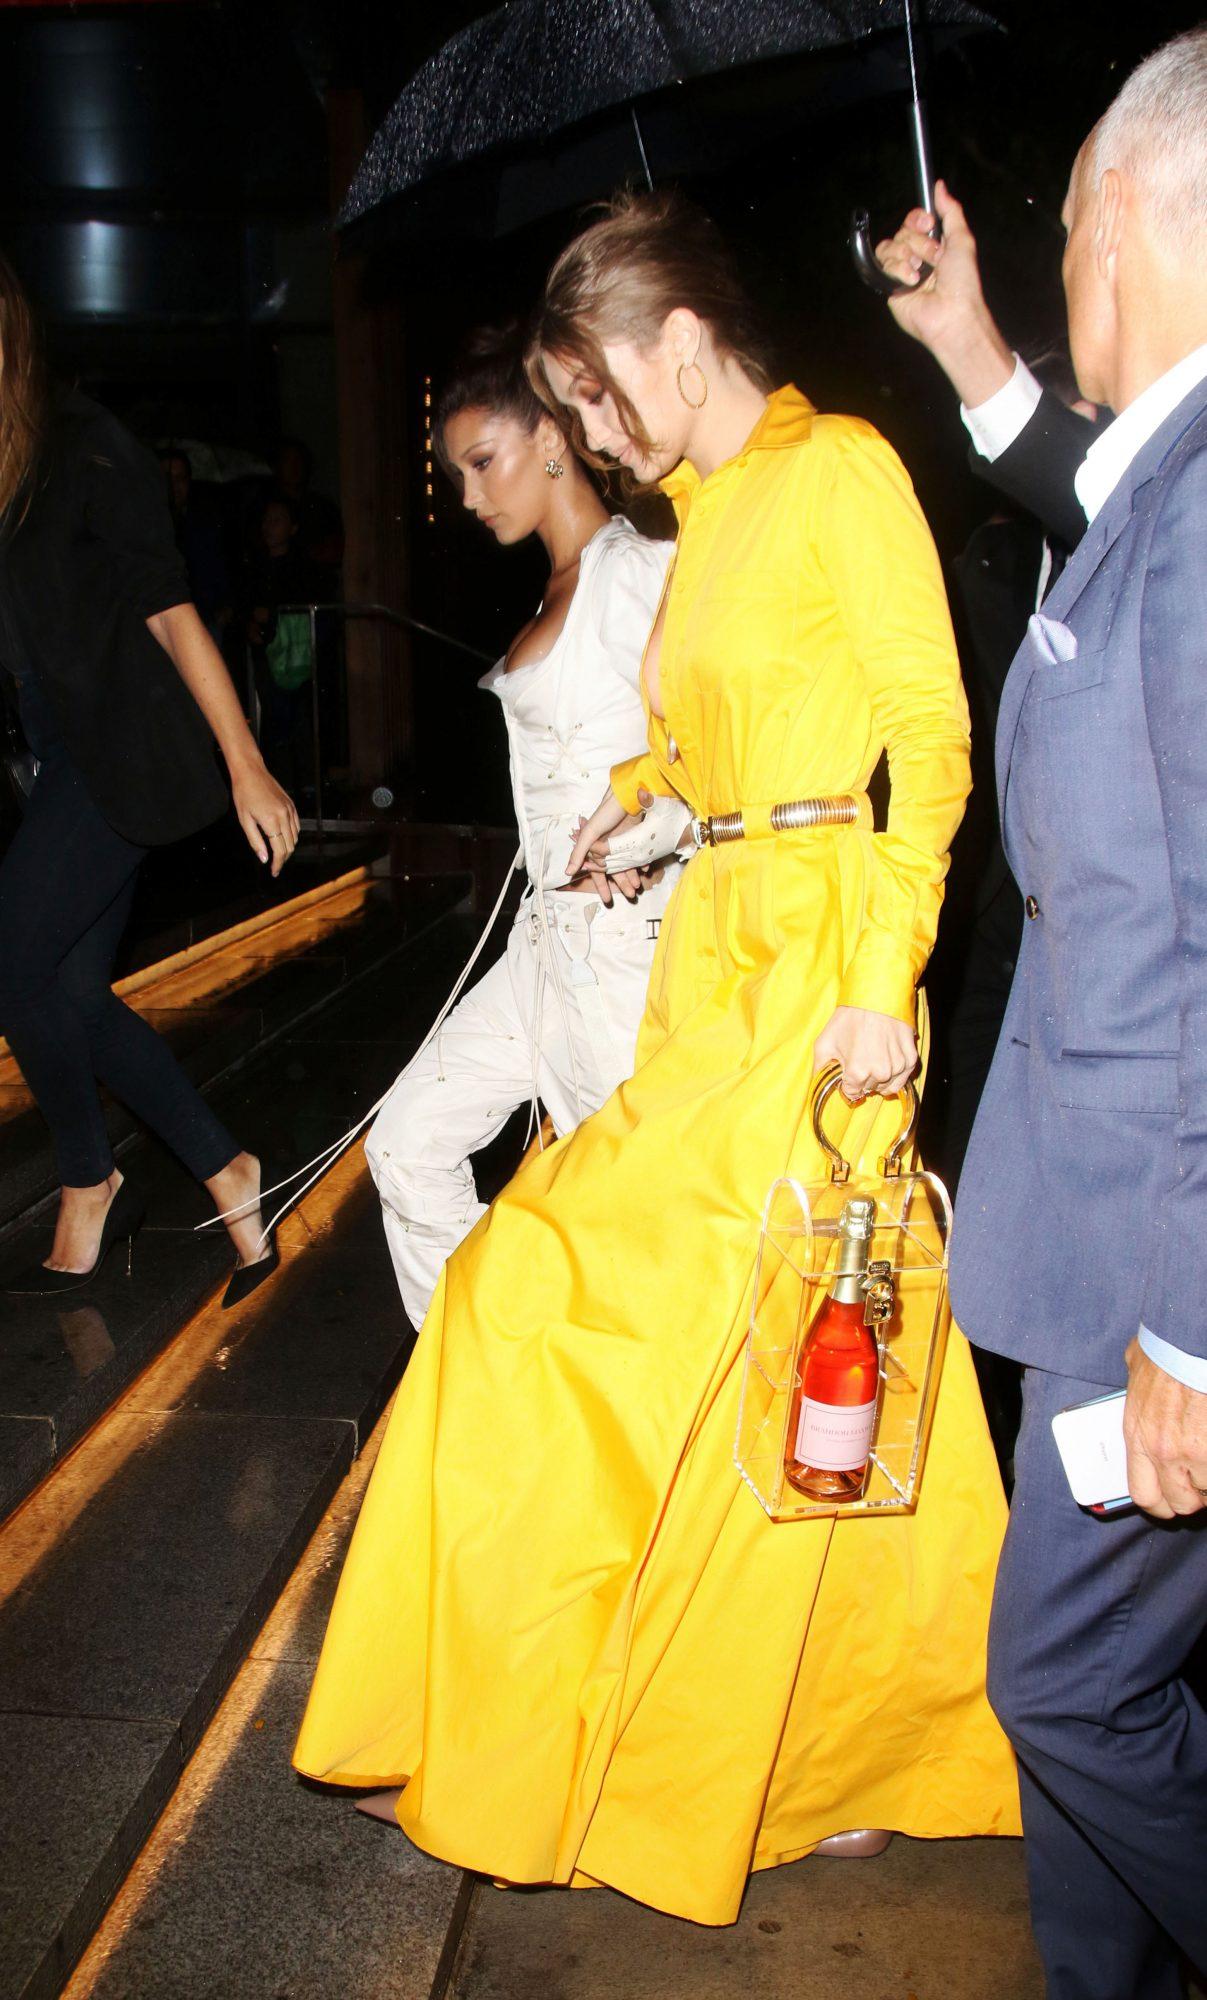 Gigi Hadid, bolso transparente, botella, champana